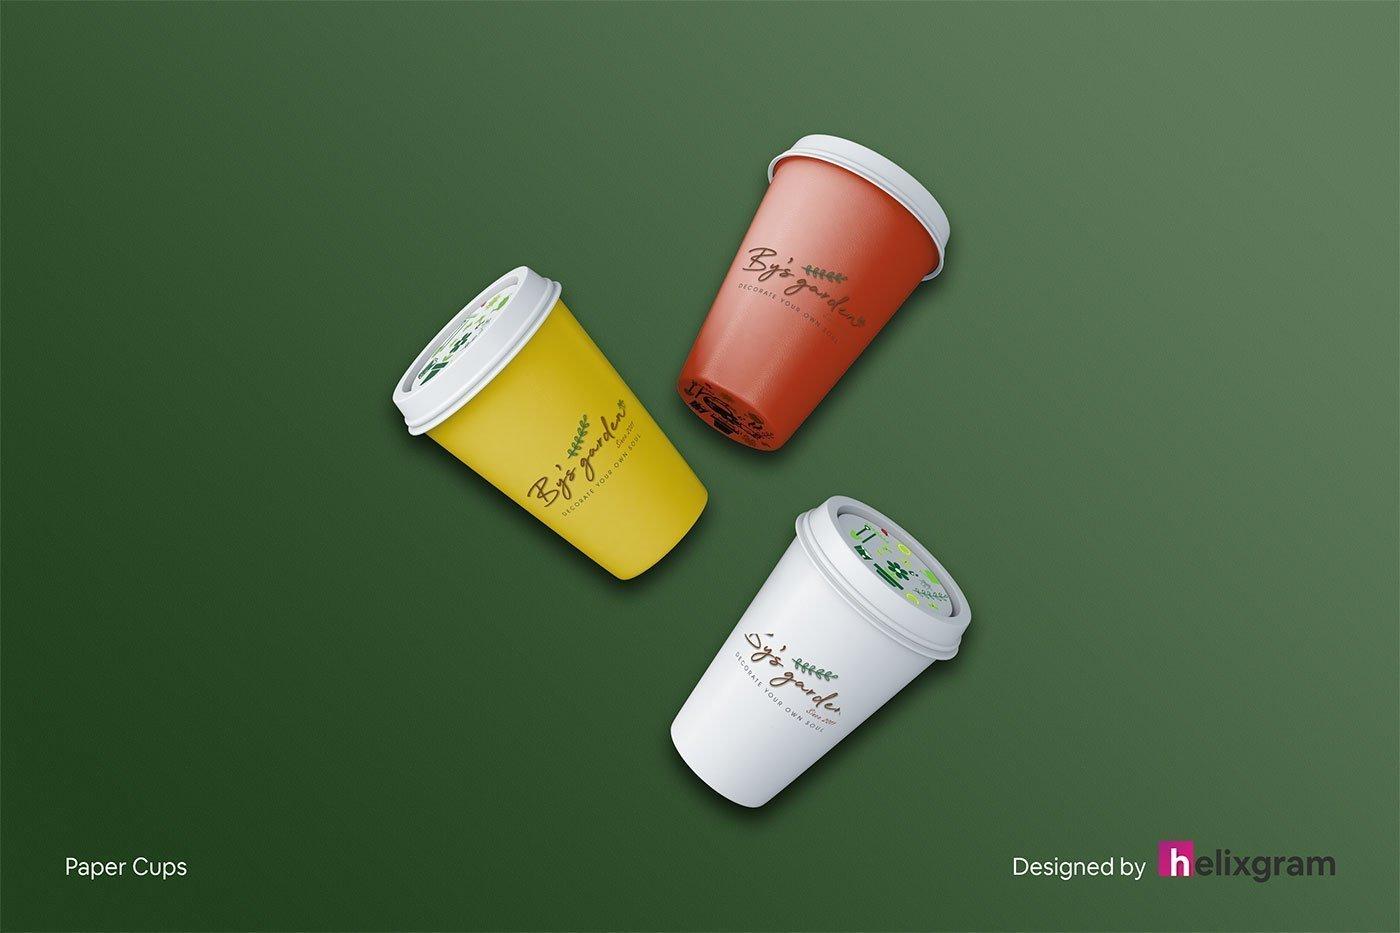 Brand-Identity-Design-paper-cup-By's-Garden-visual-identity-design-package-corporate-identity-design-logo-design-flyer-poster-book-cover-design-web-design-digital-advertising-design-Helixgram